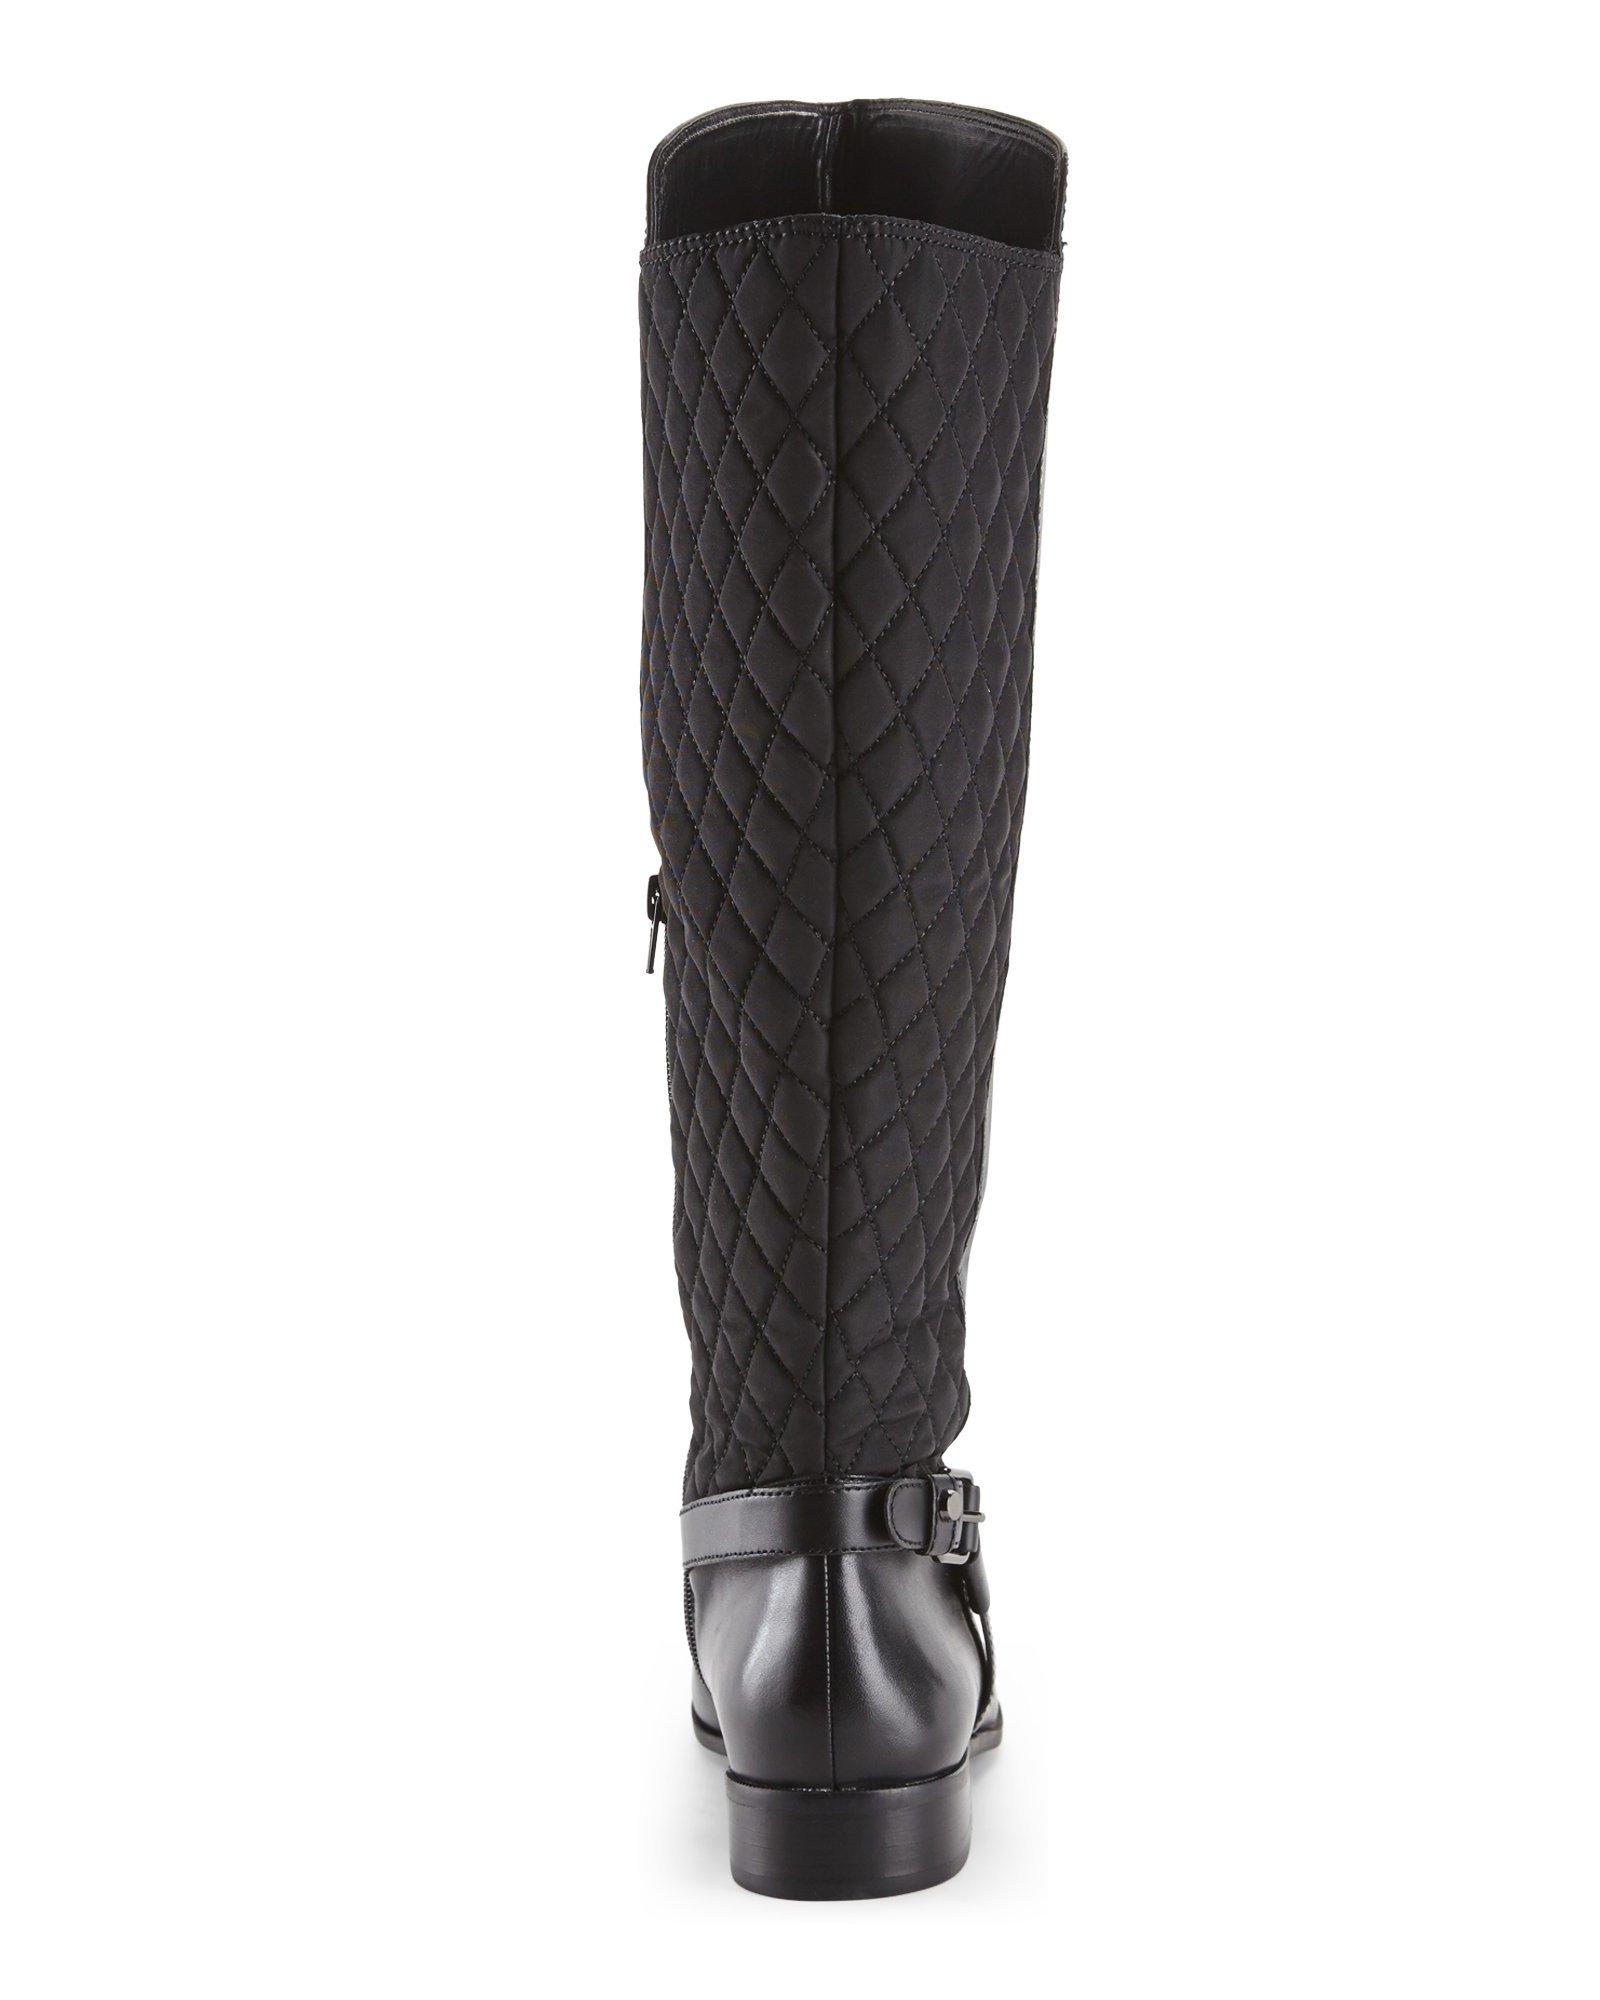 4657cb934d1 Anne Klein Black Kahlan Wide Calf Riding Boots